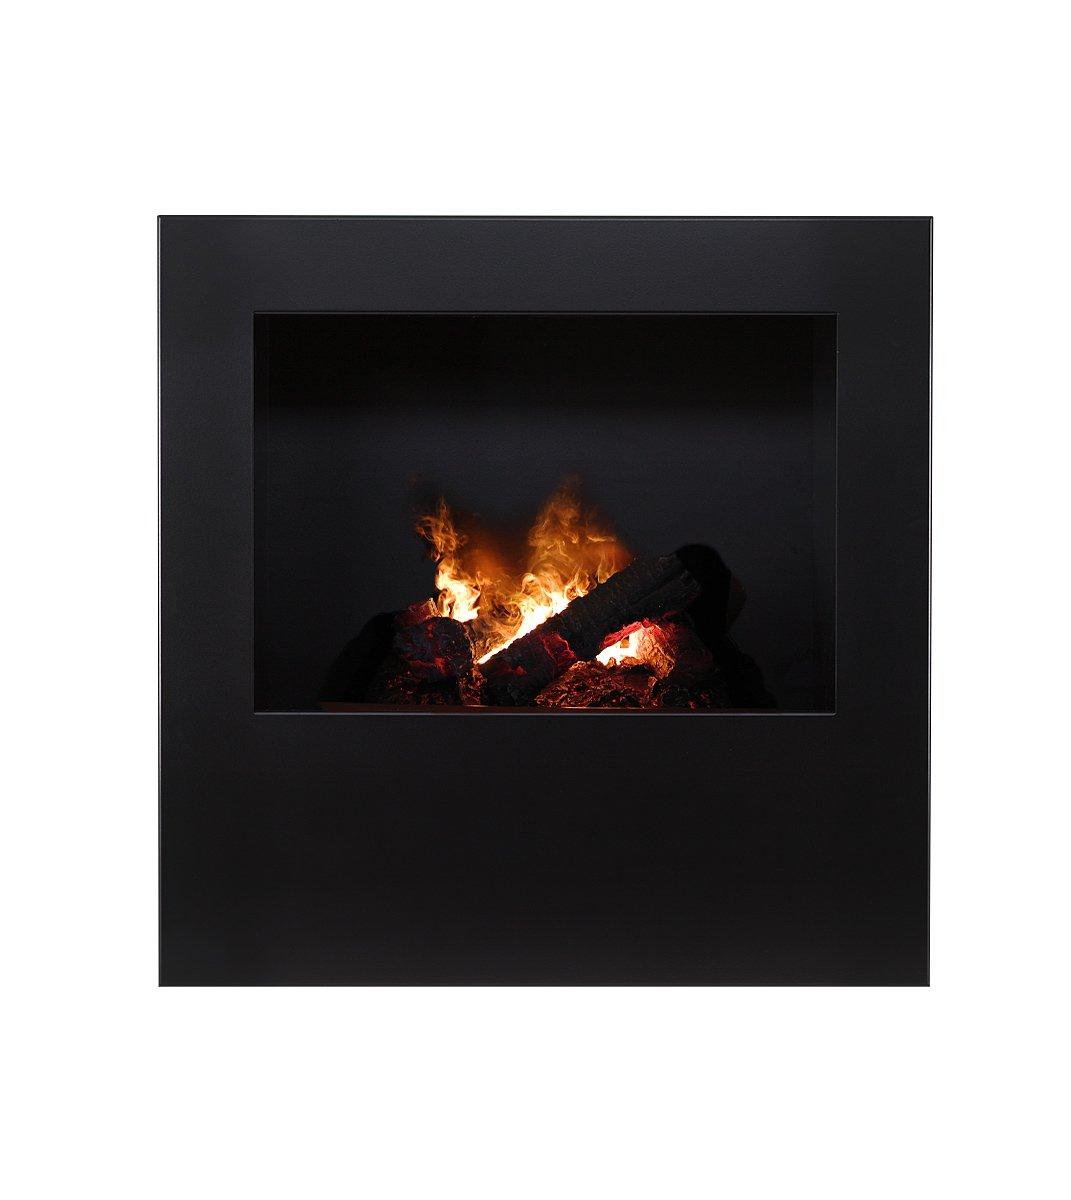 Magma infrarrojos-estufa de leña 04, chimenea eléctrica de calor Optimyst con verdadera, controlado por radio: Amazon.es: Hogar